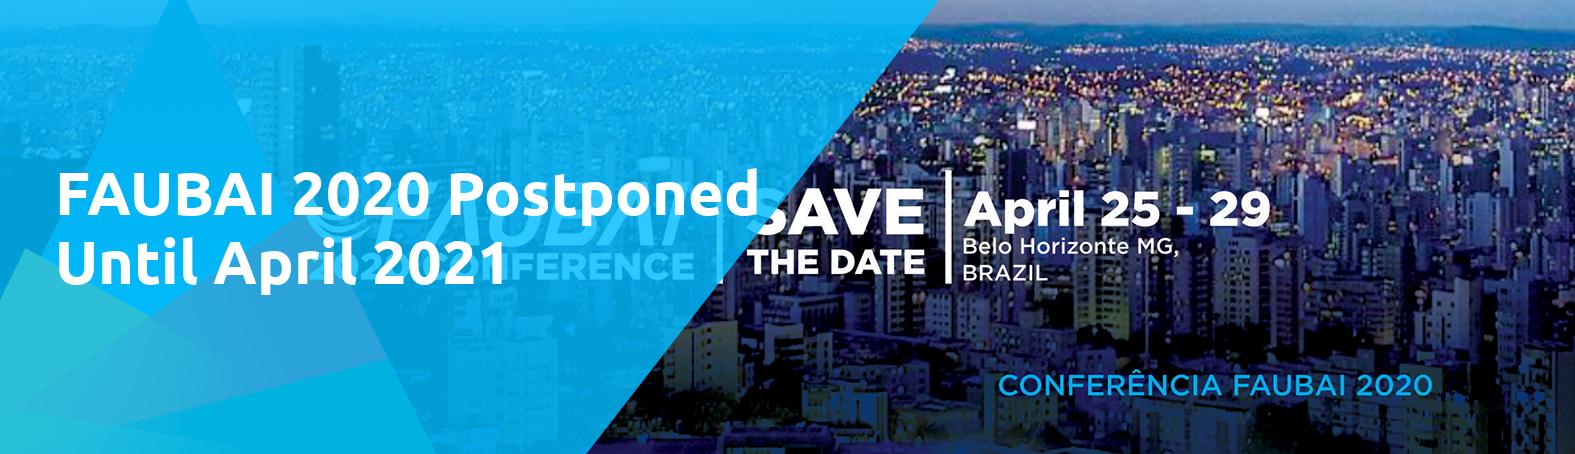 FAUBAI Conference 2020